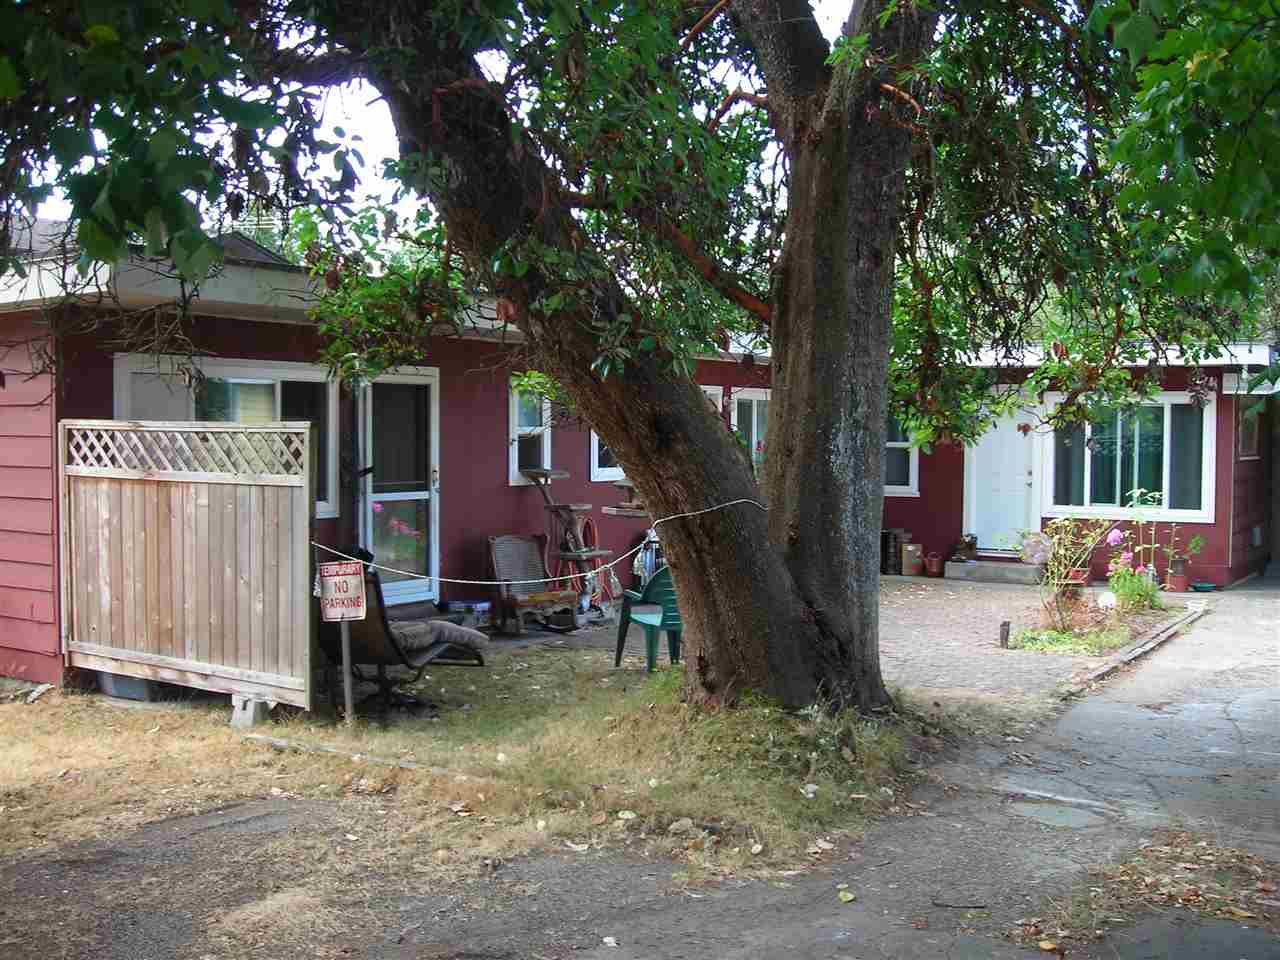 Main Photo: 5675 WHARF Avenue in Sechelt: Sechelt District Multifamily for sale (Sunshine Coast)  : MLS®# R2294412